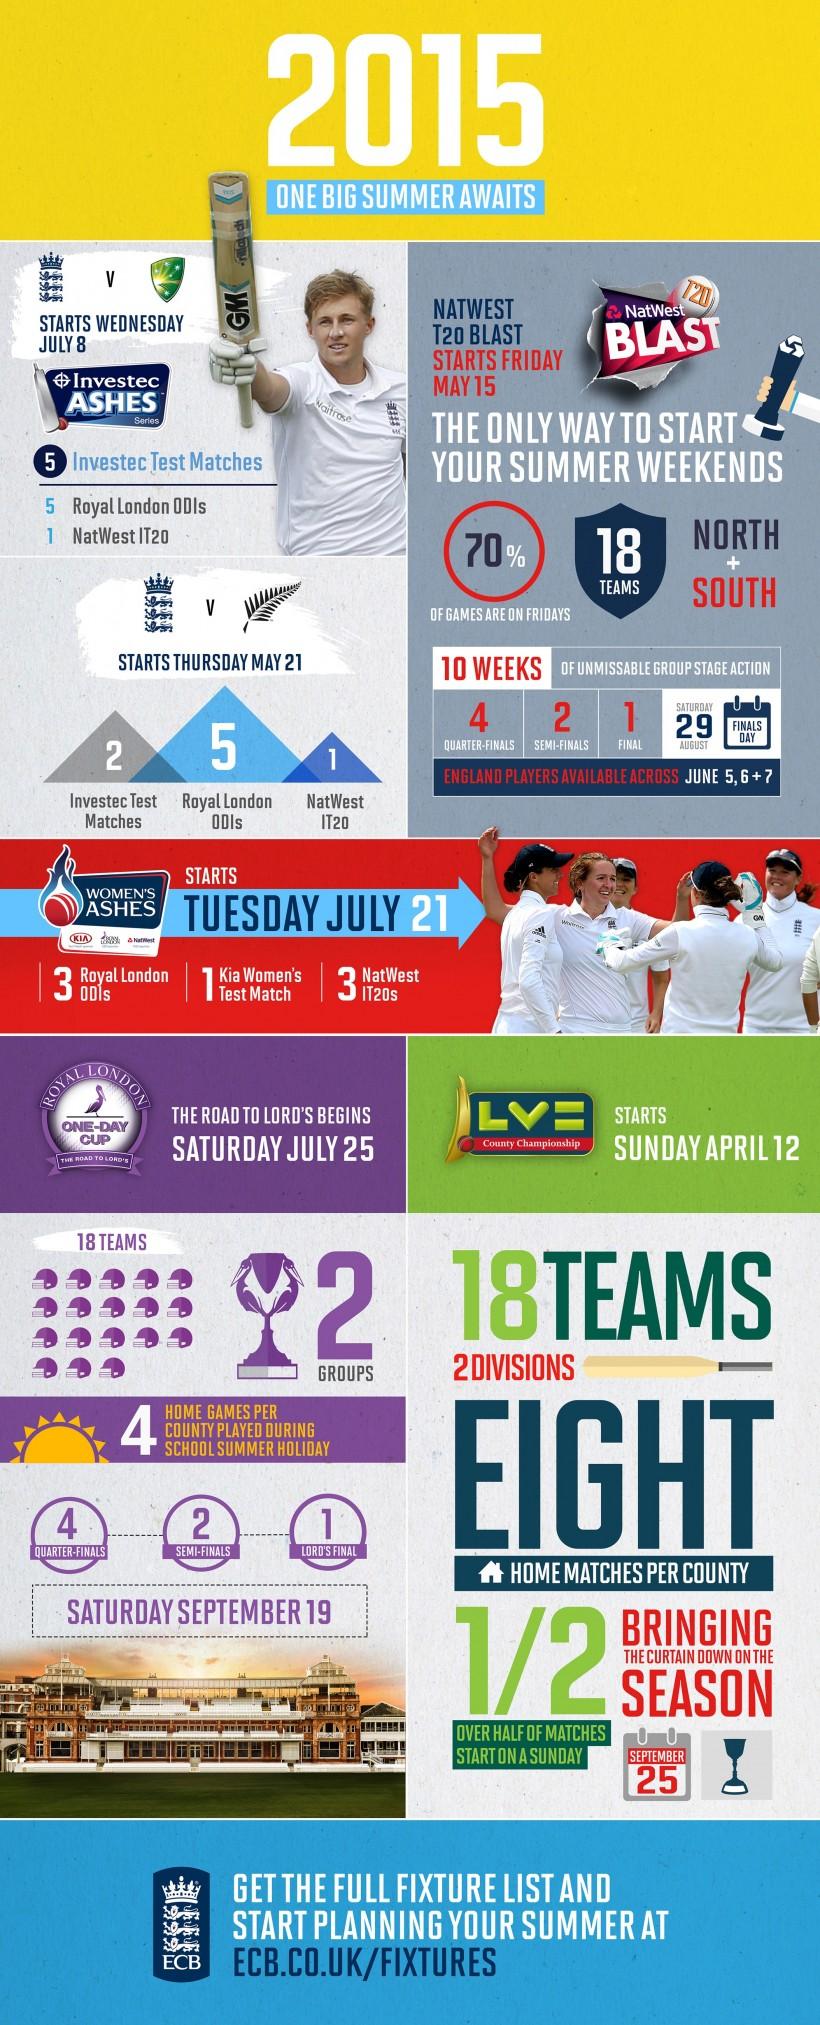 2015 fixtures explained